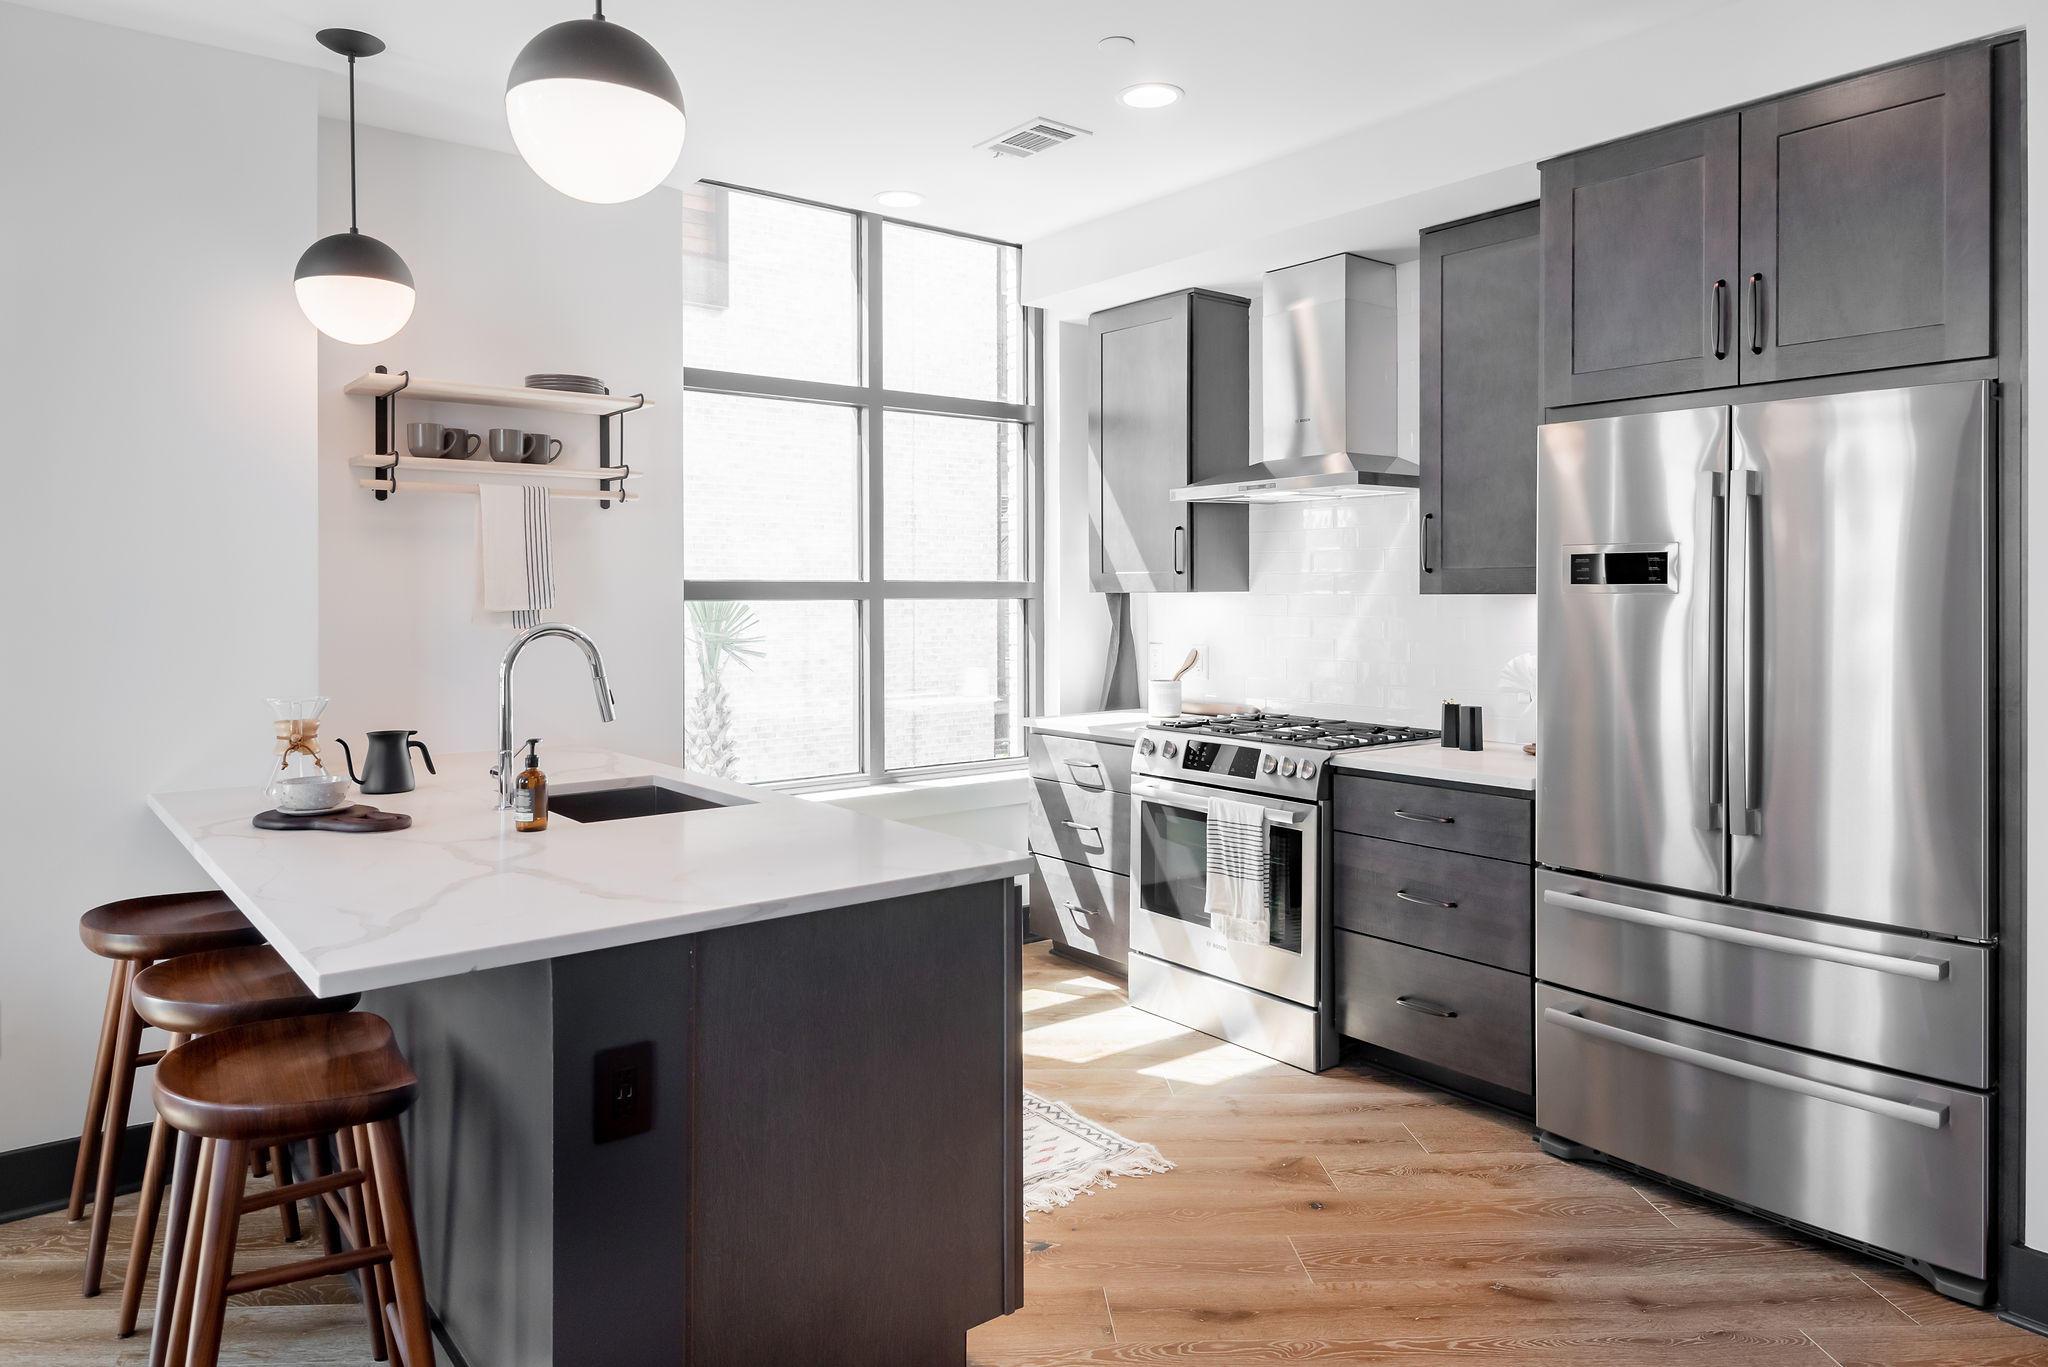 Gadsdenboro Homes For Sale - 5 Gadsdenboro, Charleston, SC - 3